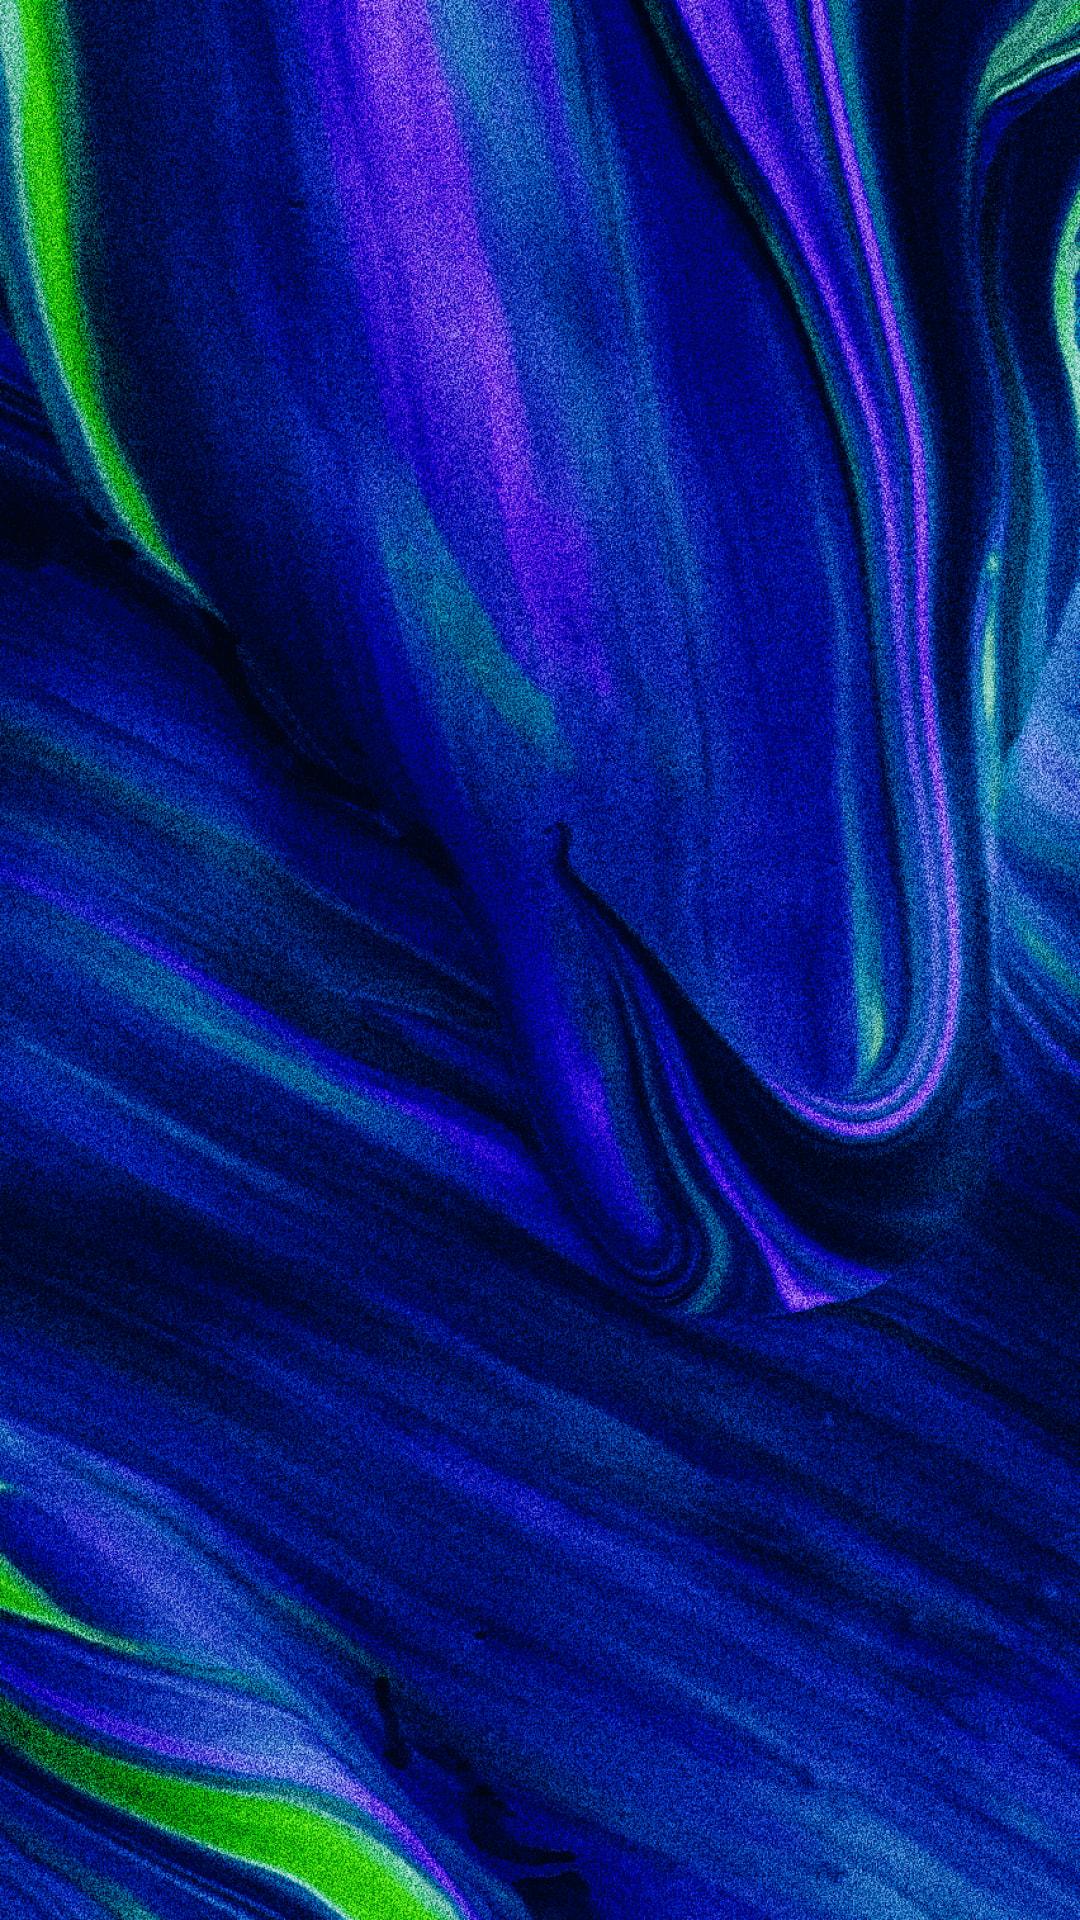 Abstract Liquid Wallpapers Iphone Wallpaper